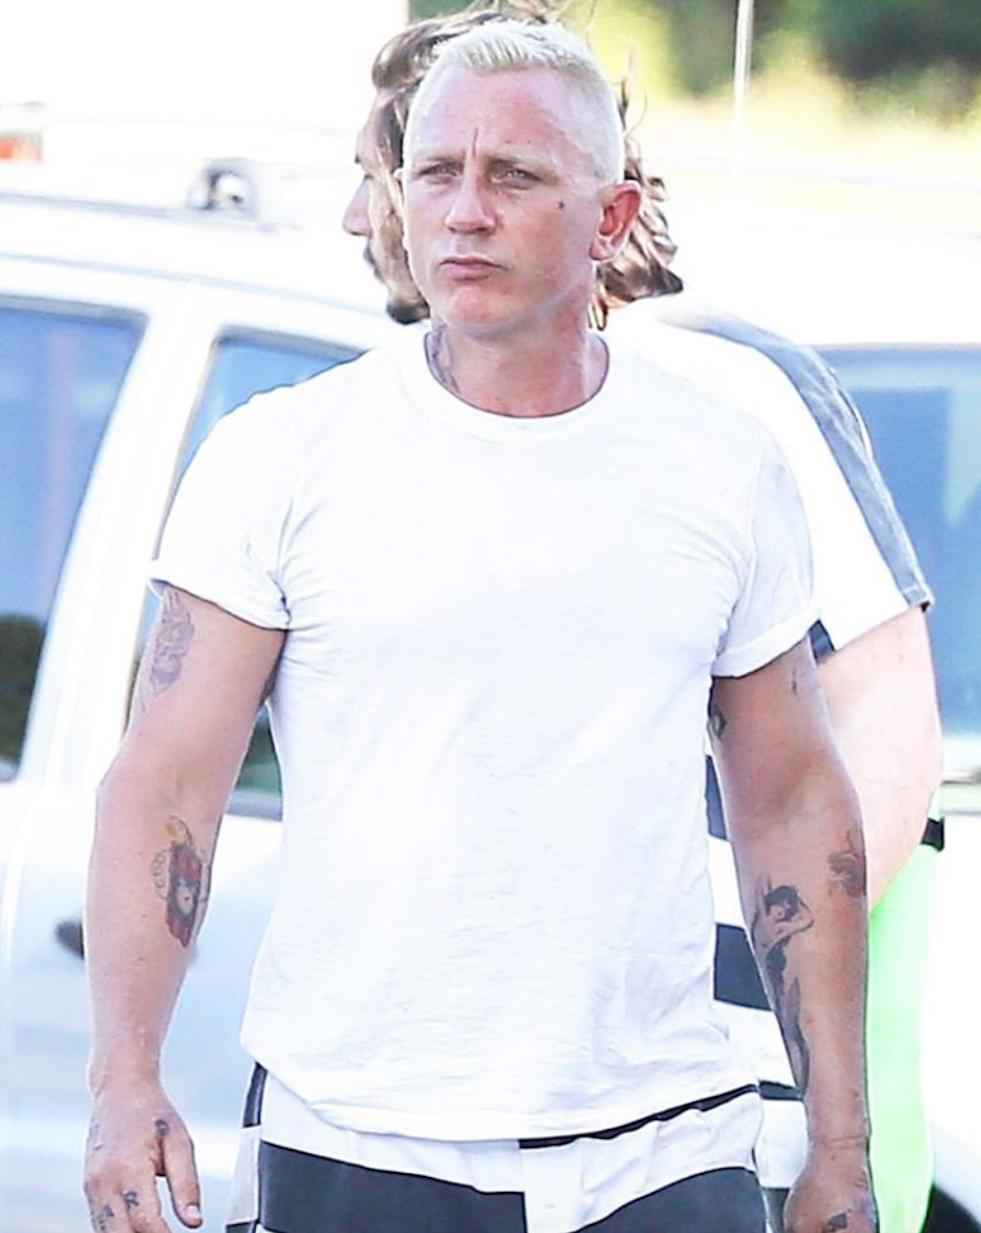 Дэниэл Крэйг стал платиновым блондином и набил тату   www ... дэниэл крэйг